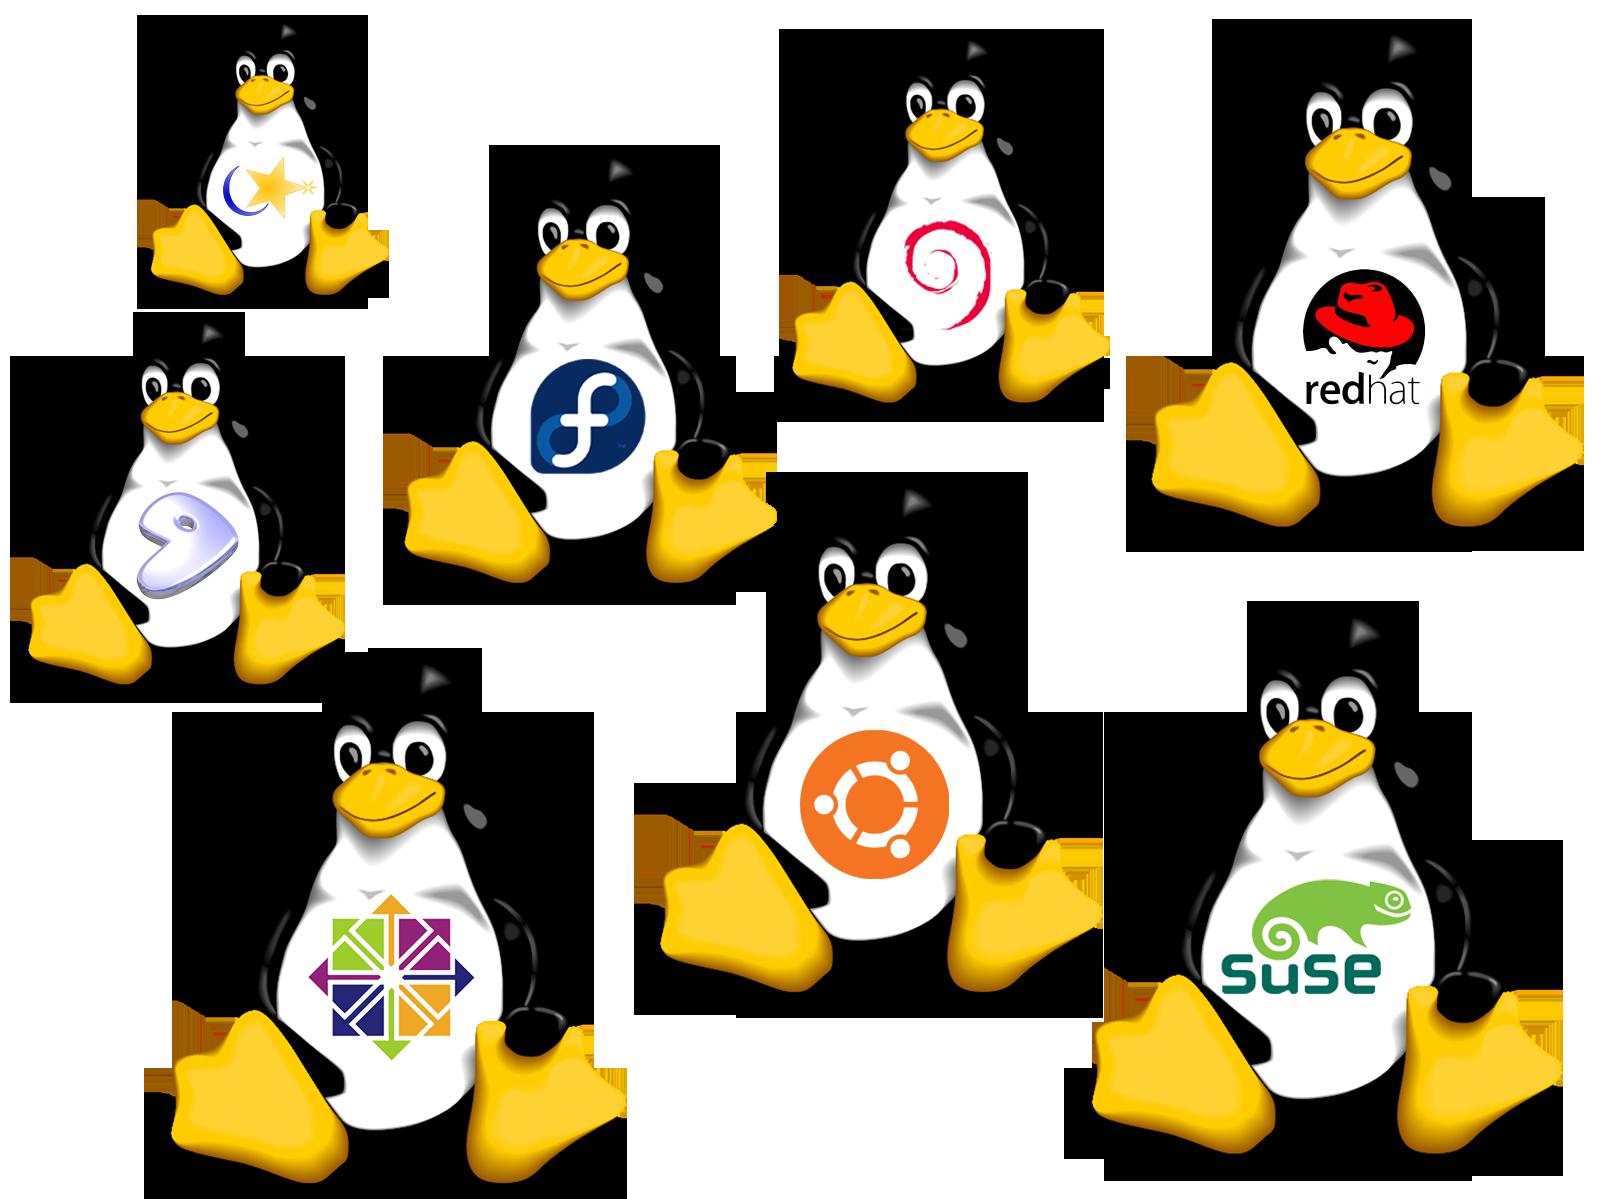 linux_distros kernel linux 4.6.5